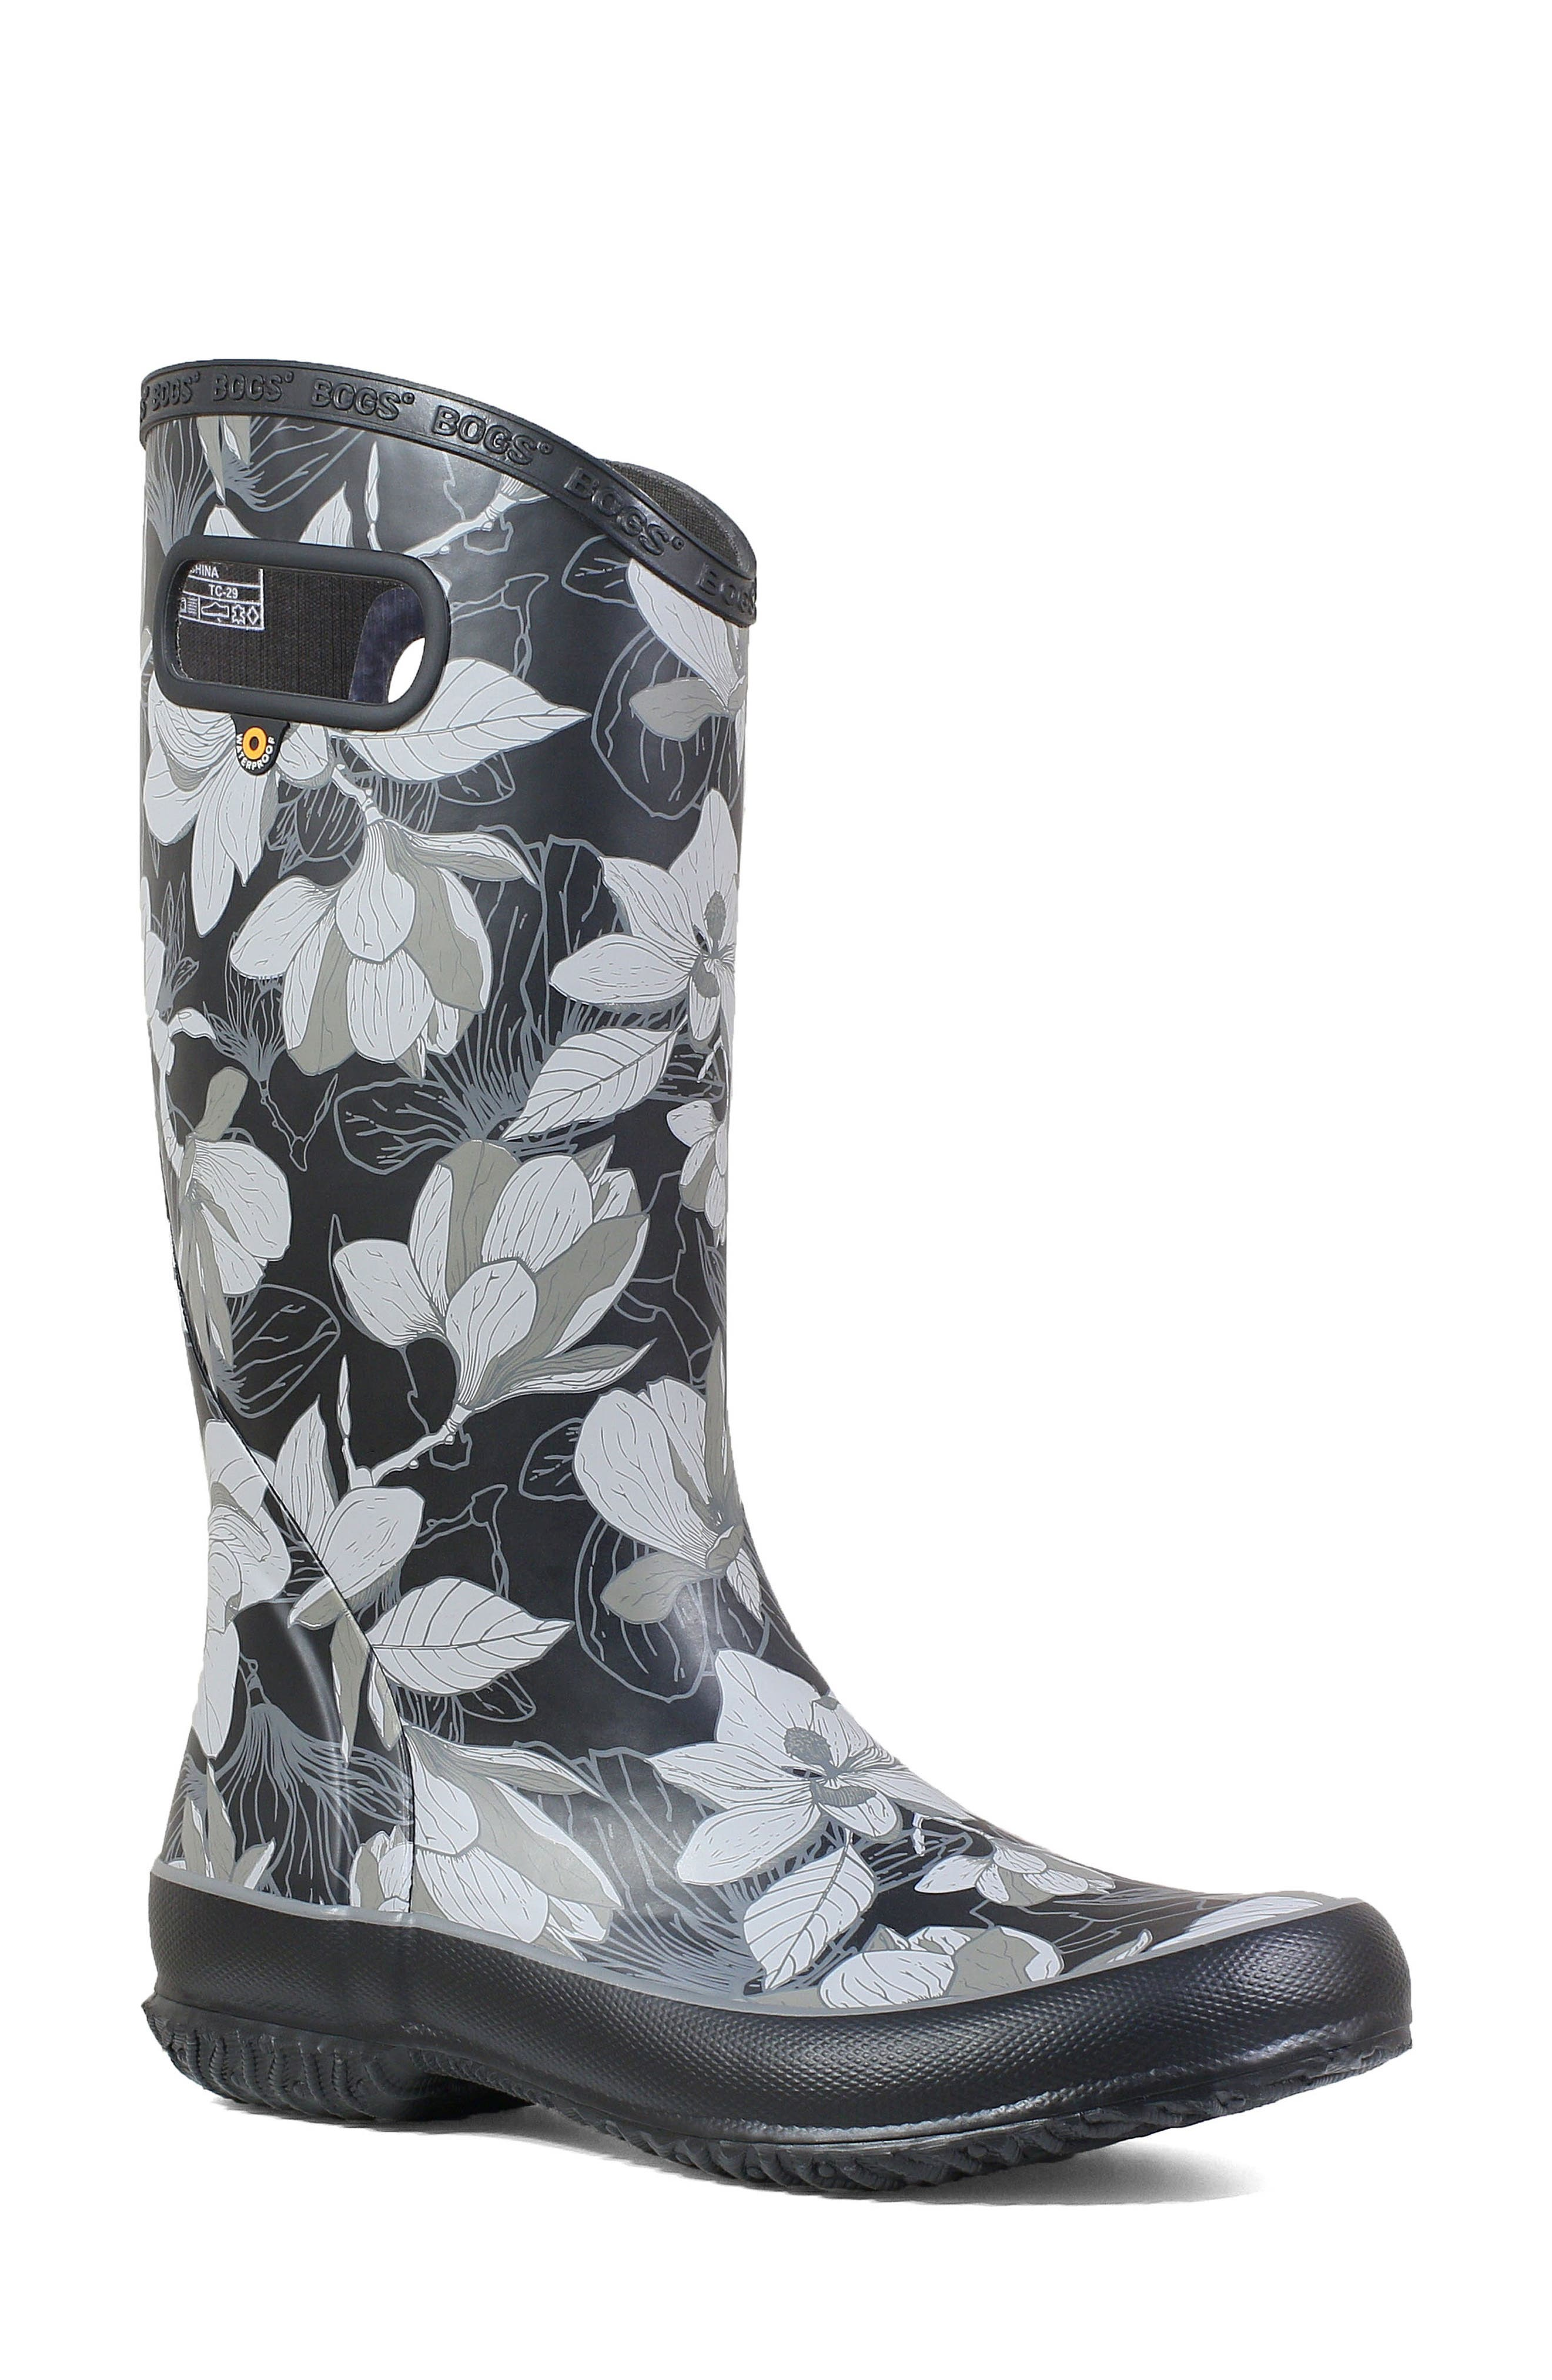 BOGS, Classic Tall Waterproof Rain Boot, Main thumbnail 1, color, BLACK MULTI RUBBER